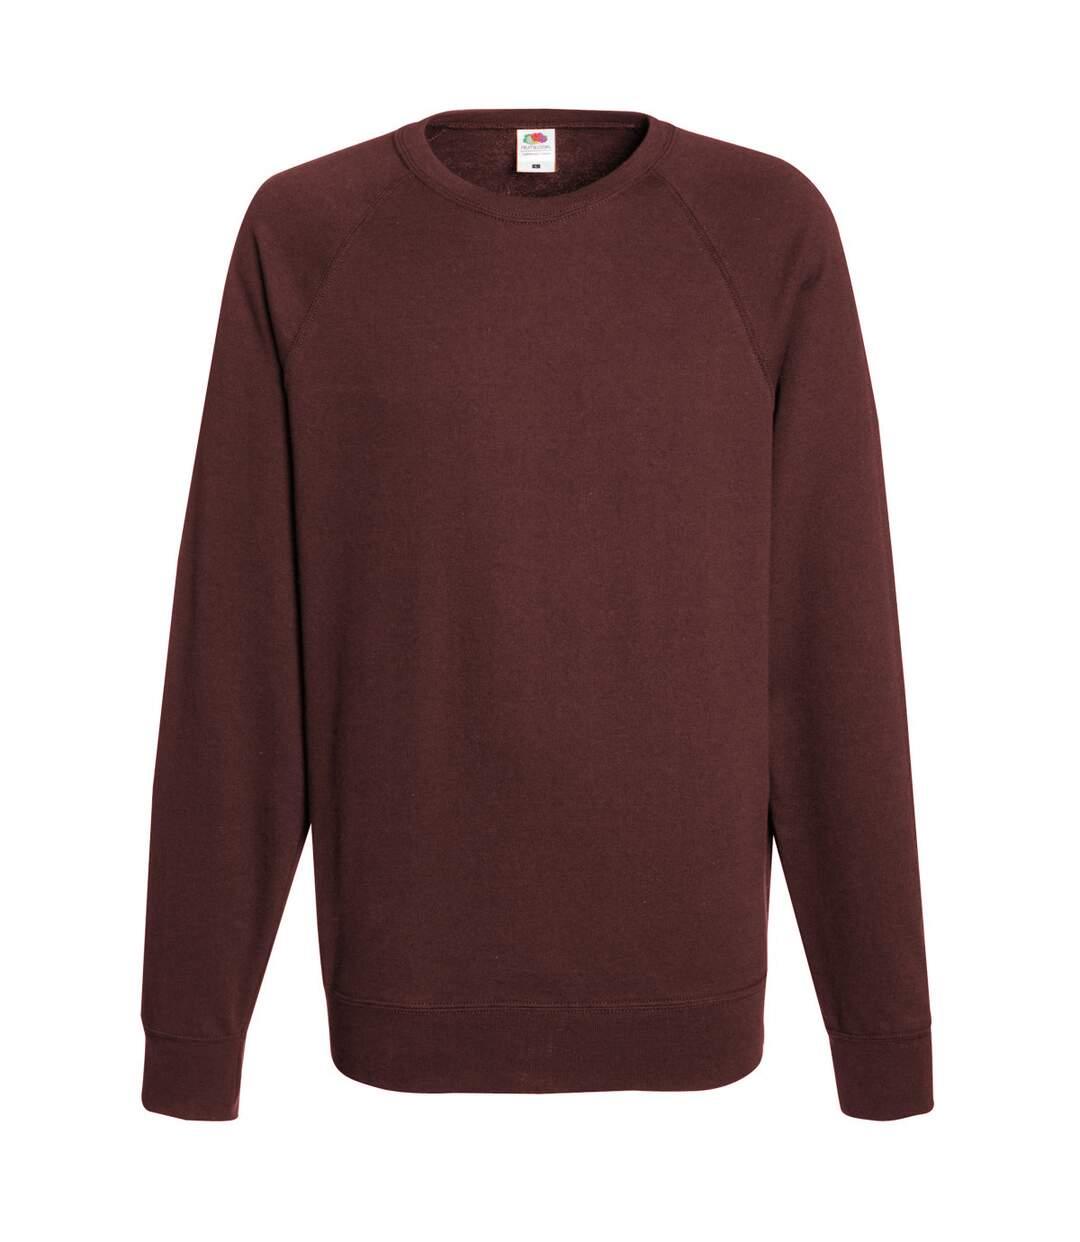 Fruit Of The Loom Mens Lightweight Raglan Sweatshirt (240 GSM) (Bottle Green) - UTBC2653